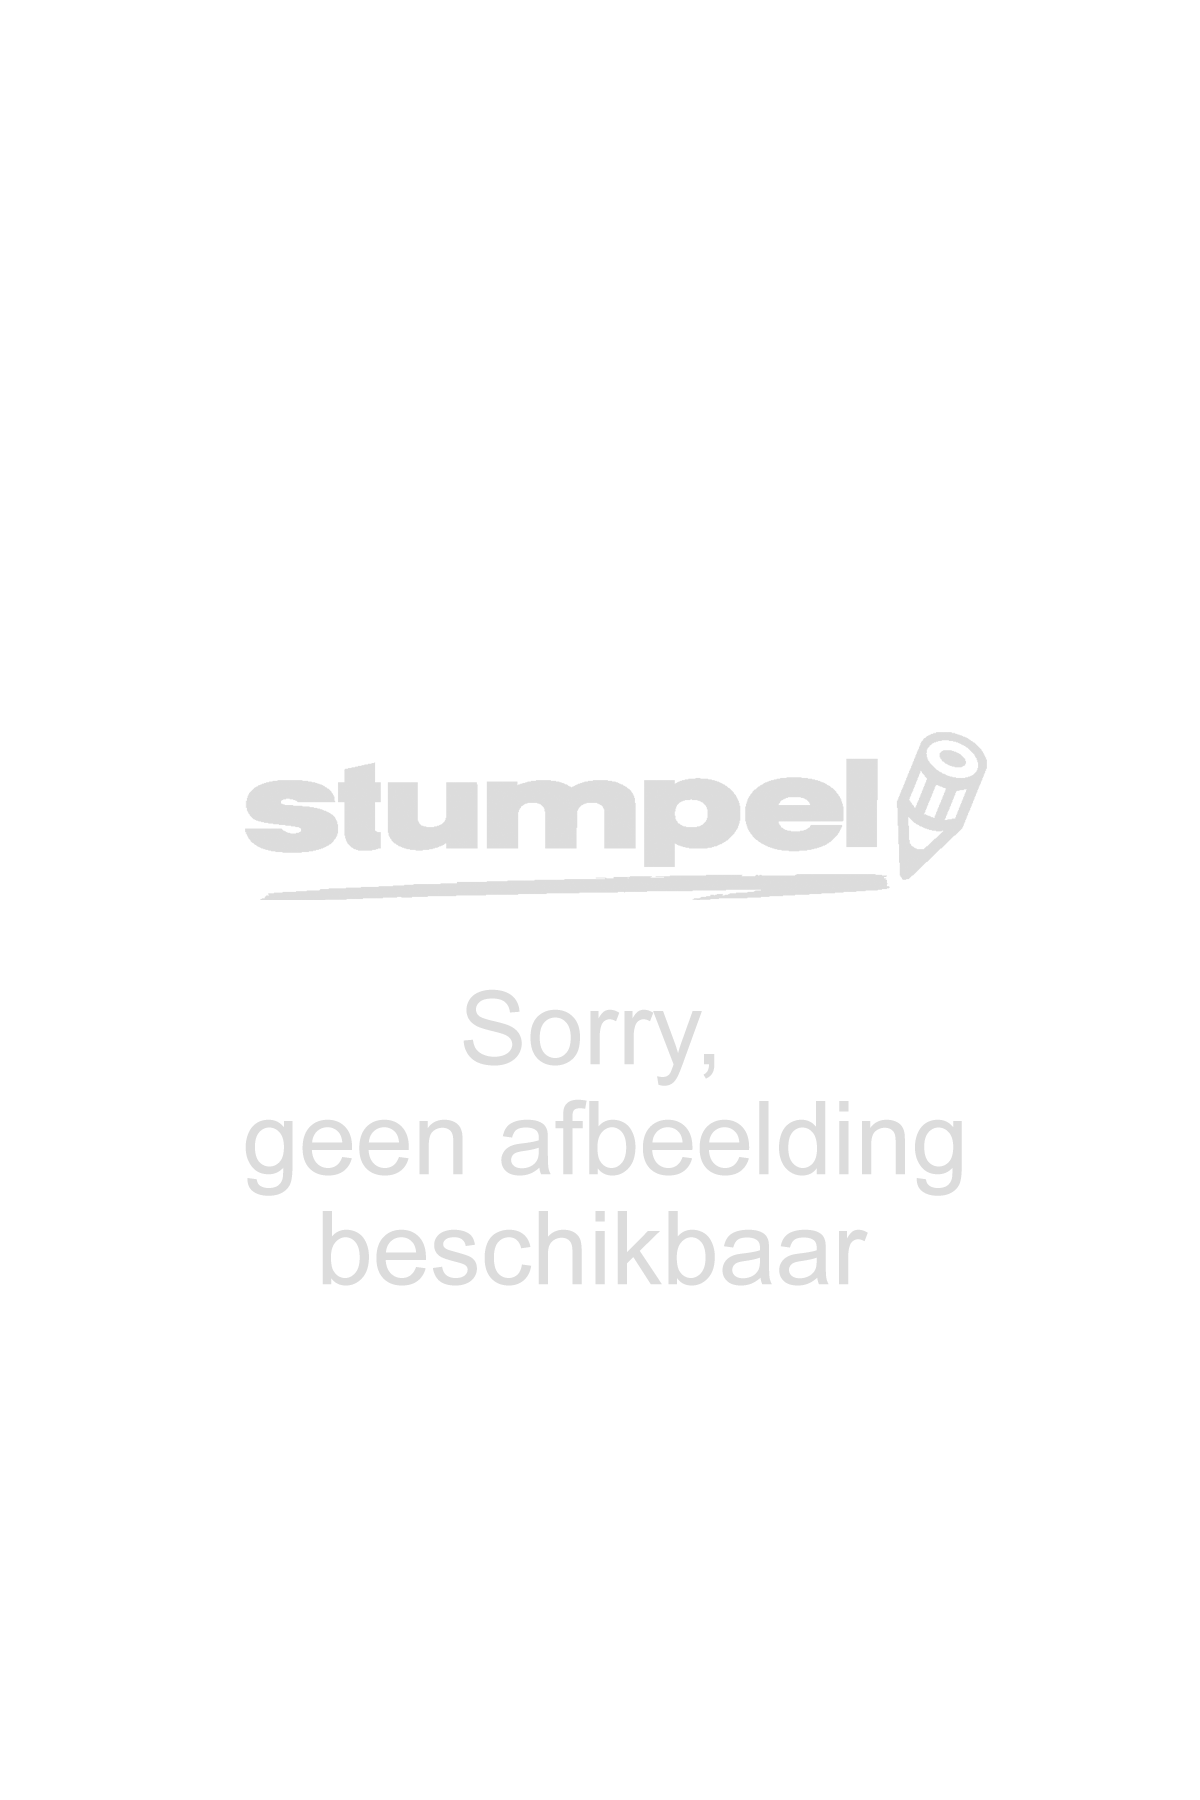 agenda-2021-ryam-compact-liggend-ringplastic-crème-6-talig-suprema-zwart-11011010